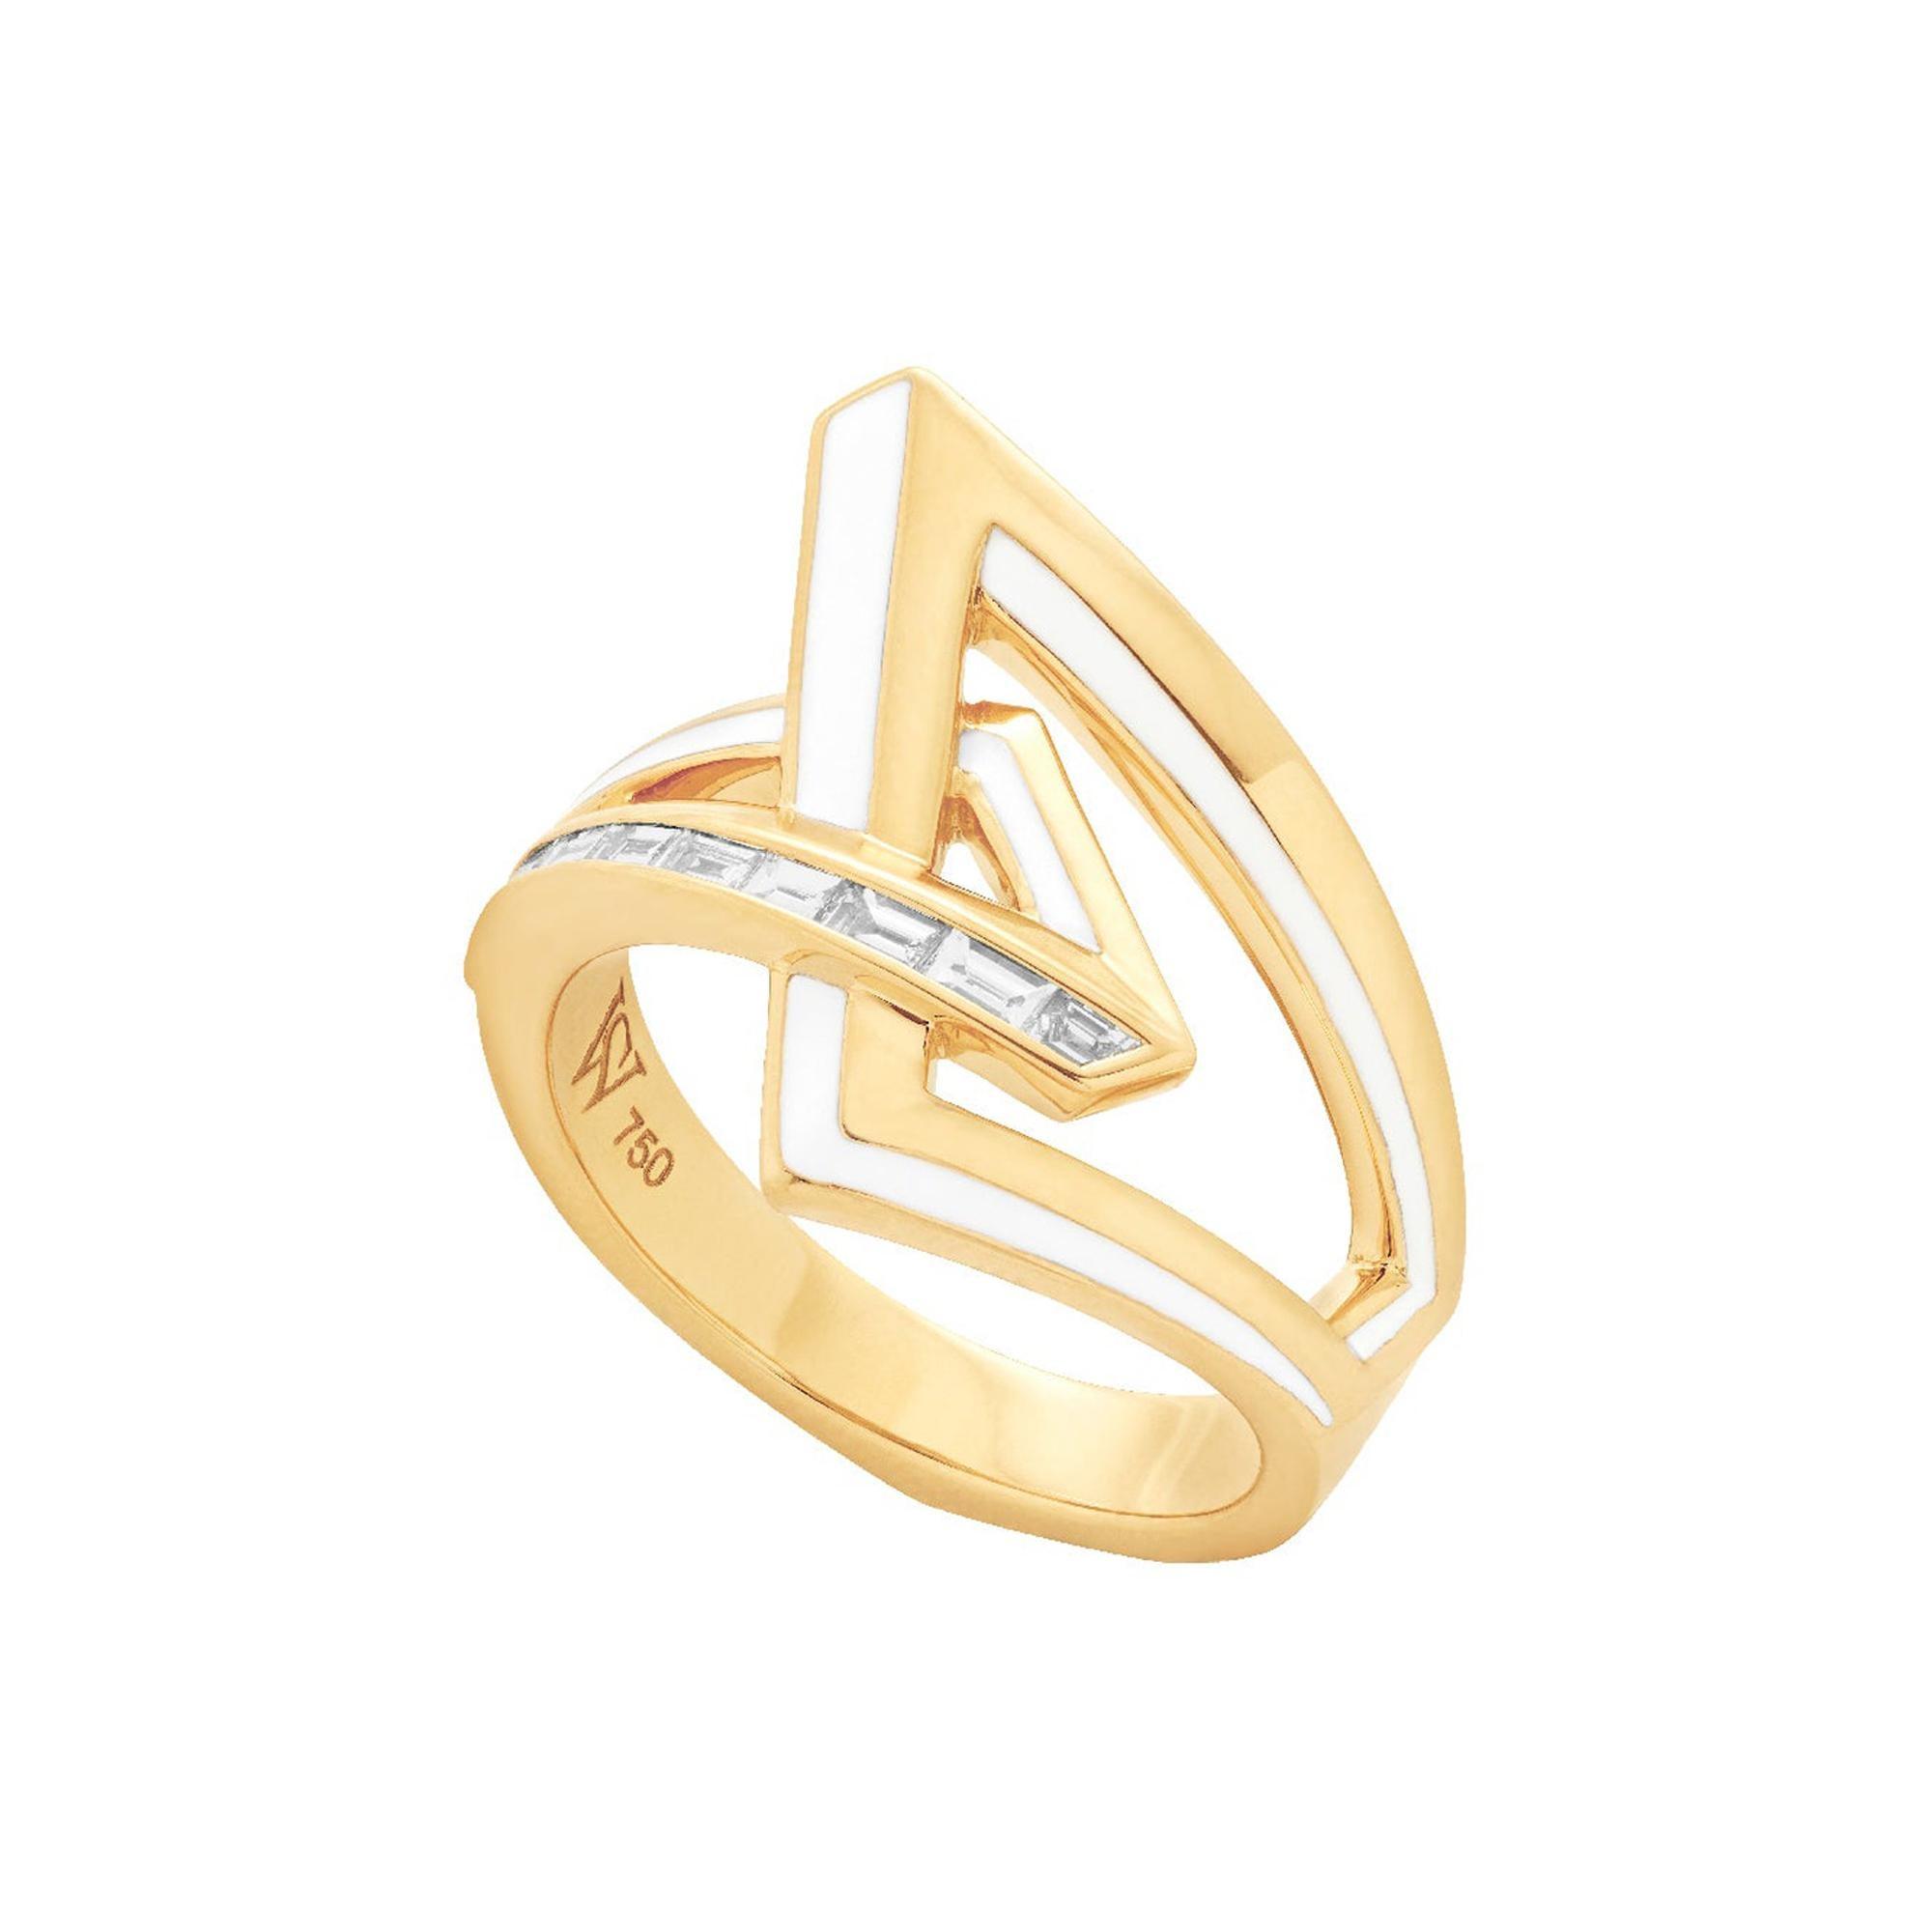 Stephen Webster Vertigo Obtuse 18 Carat Gold and White Diamond '0.29 Carat' Ring